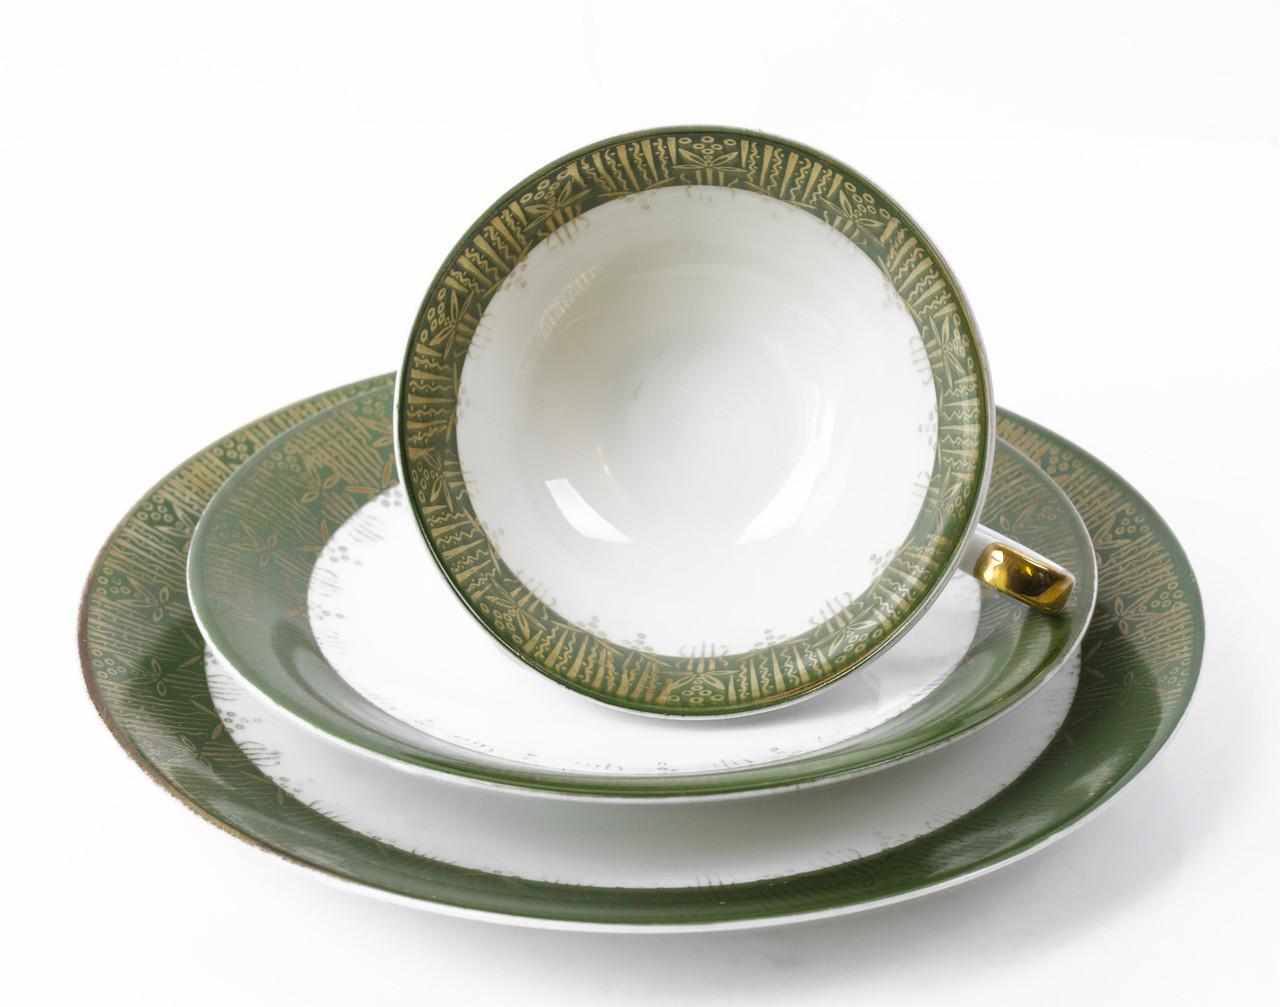 Чашка, блюдце, тарелка, фарфор, Германия, K&A Krautheim  Bavaria